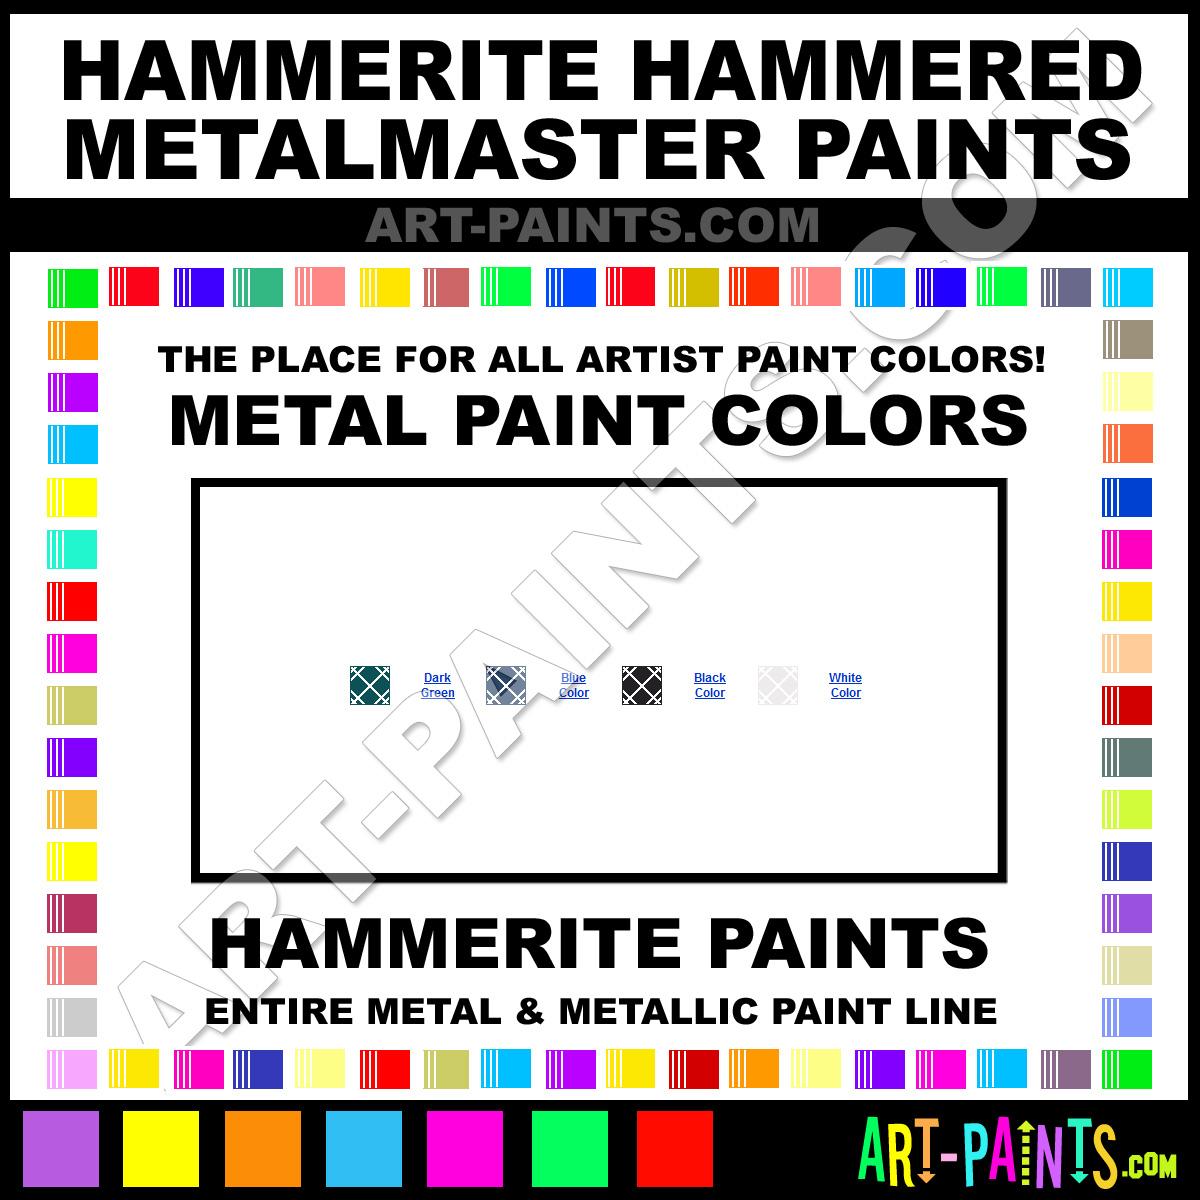 hammerite hammered metalmaster metal paint colors hammerite hammered metalmaster metallic